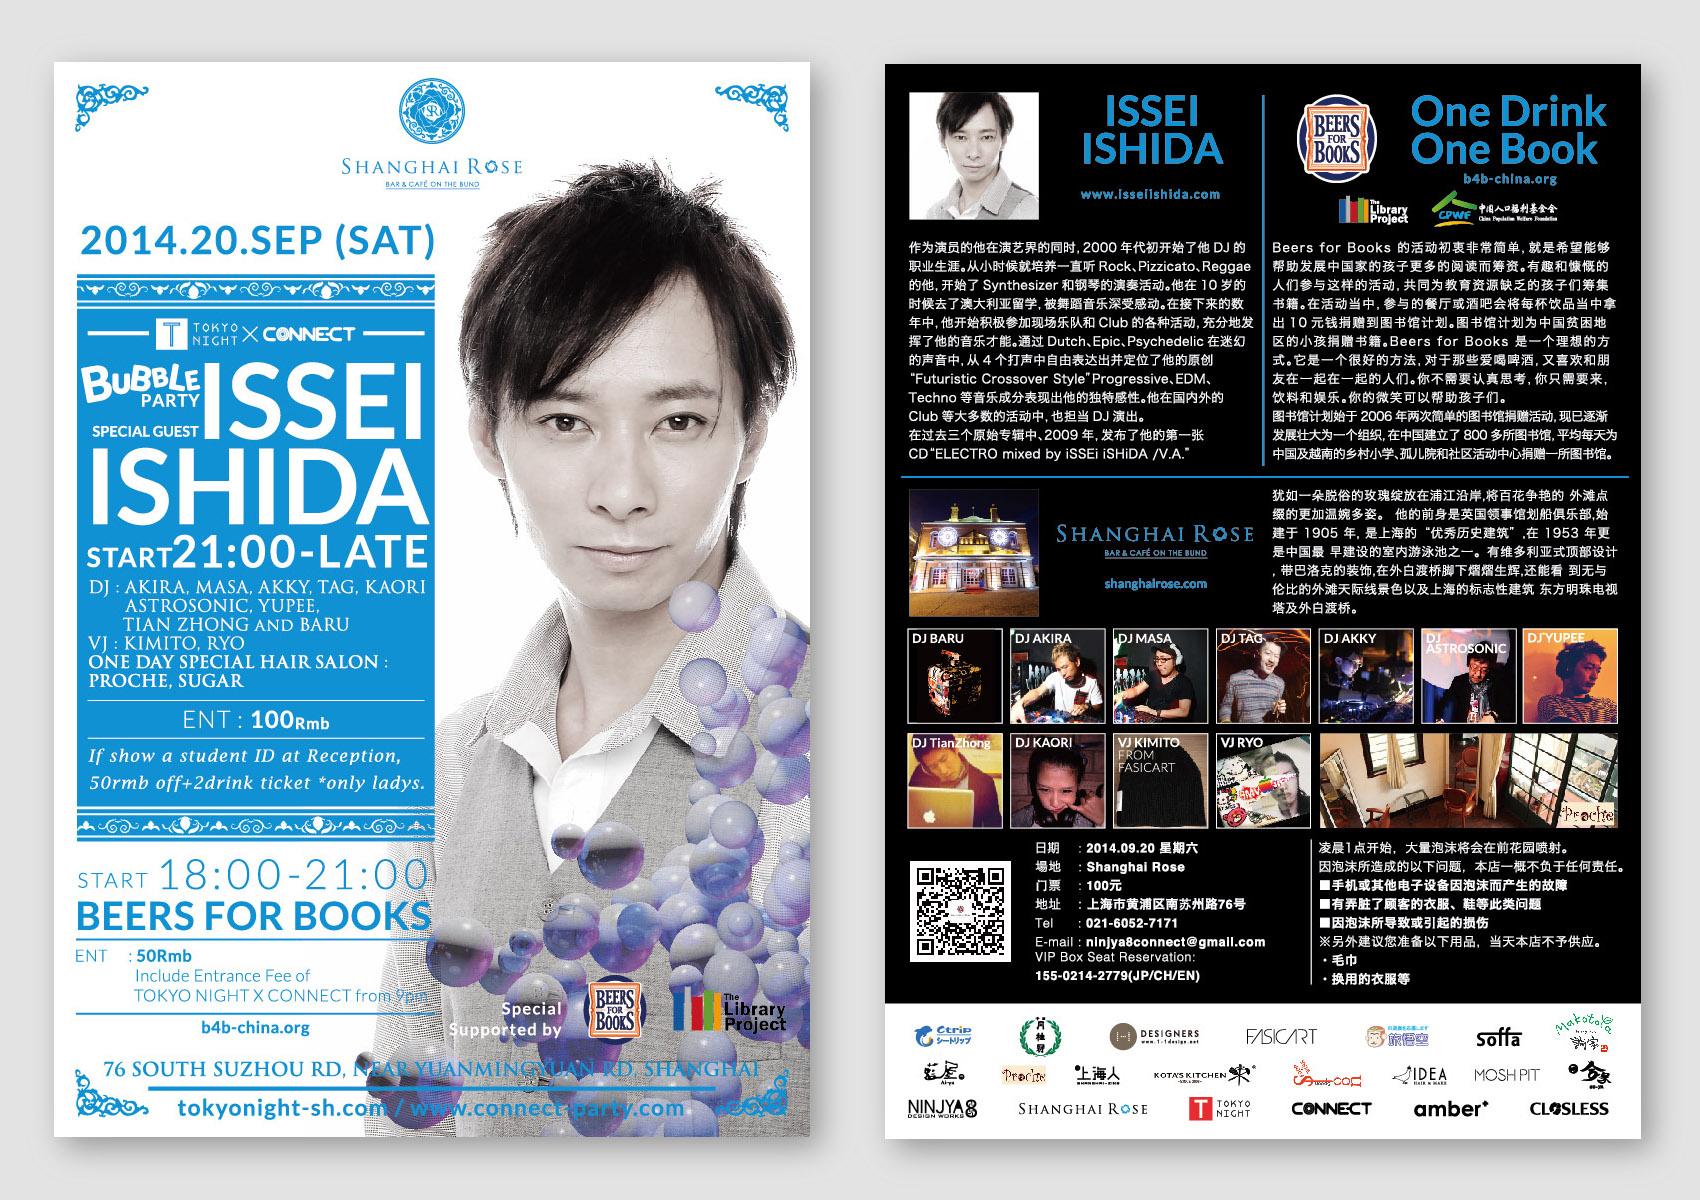 Tokyo night X Connect : Bubble party w DJ ISSEI ISHIDA